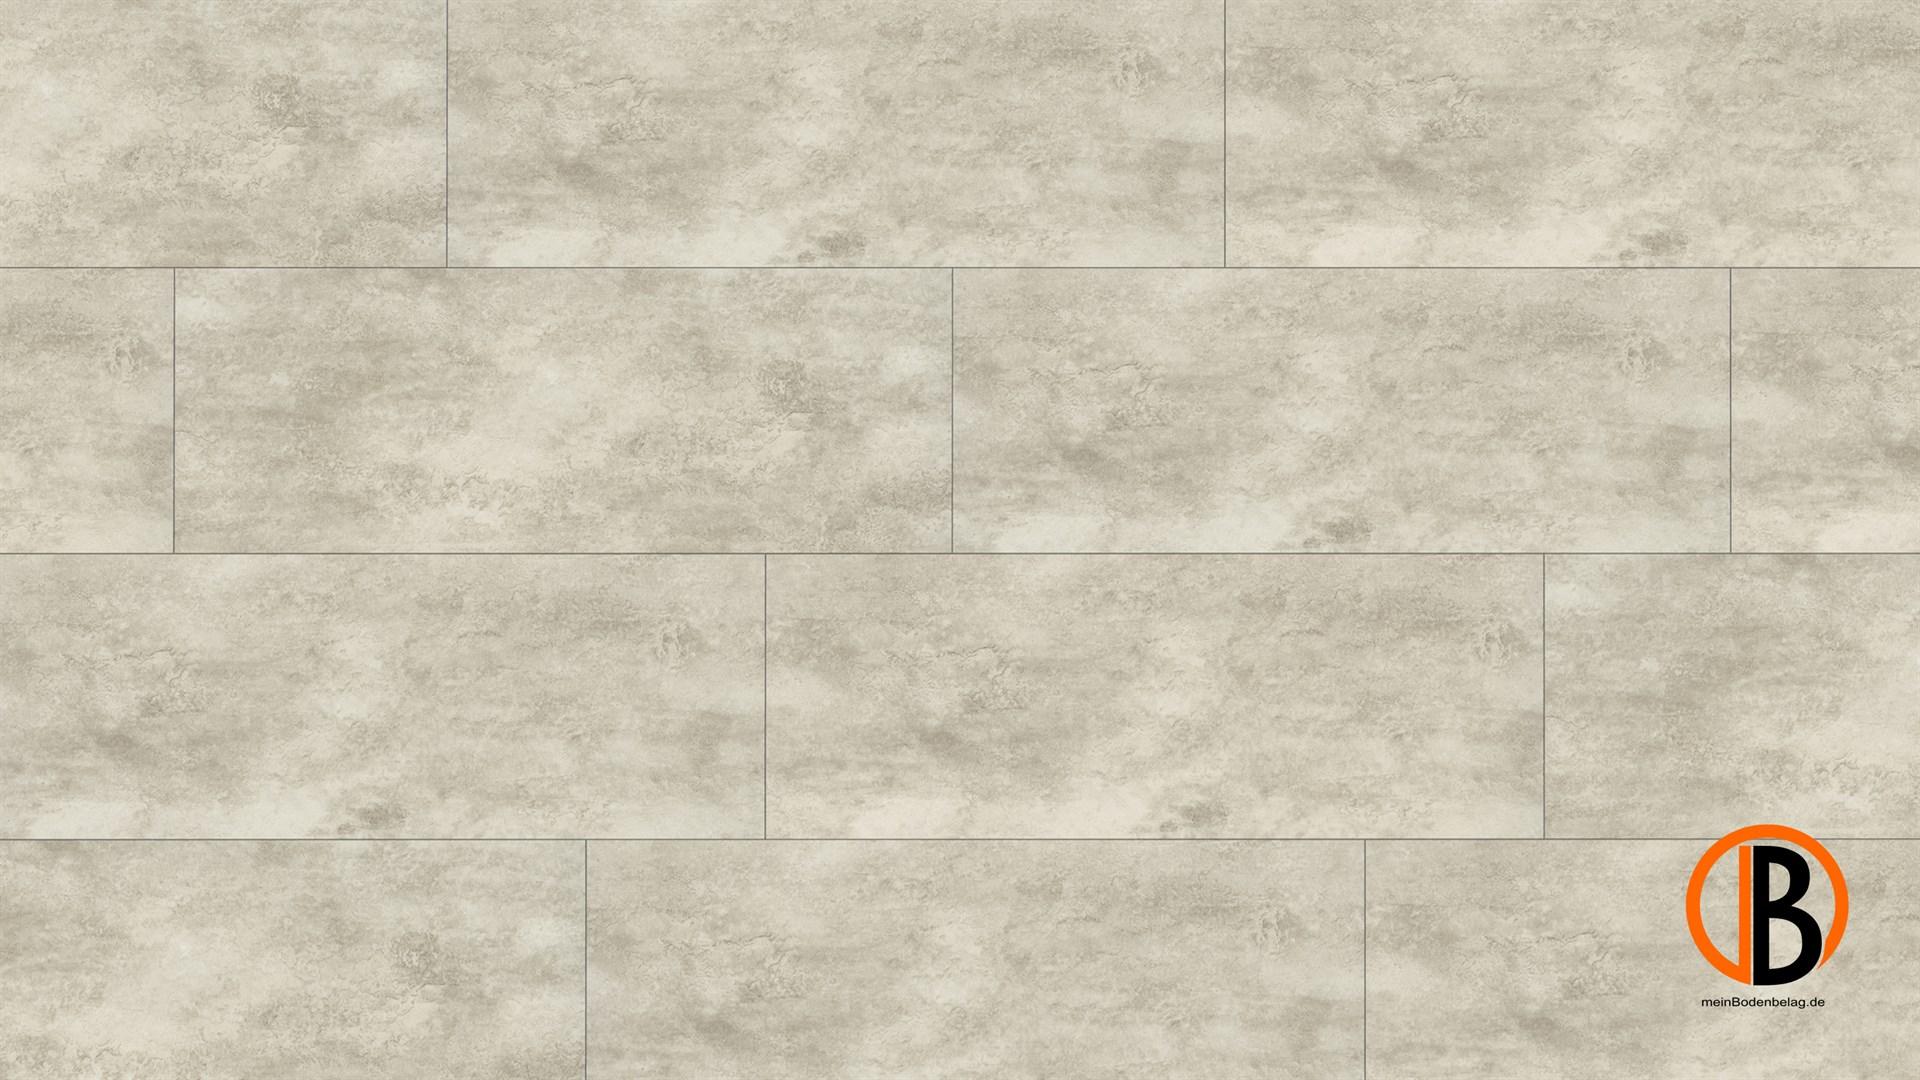 CINQUE KWG DESIGNERVINYL ANTIGUA STONE SHEETS | 10000281;0 | Bild 1